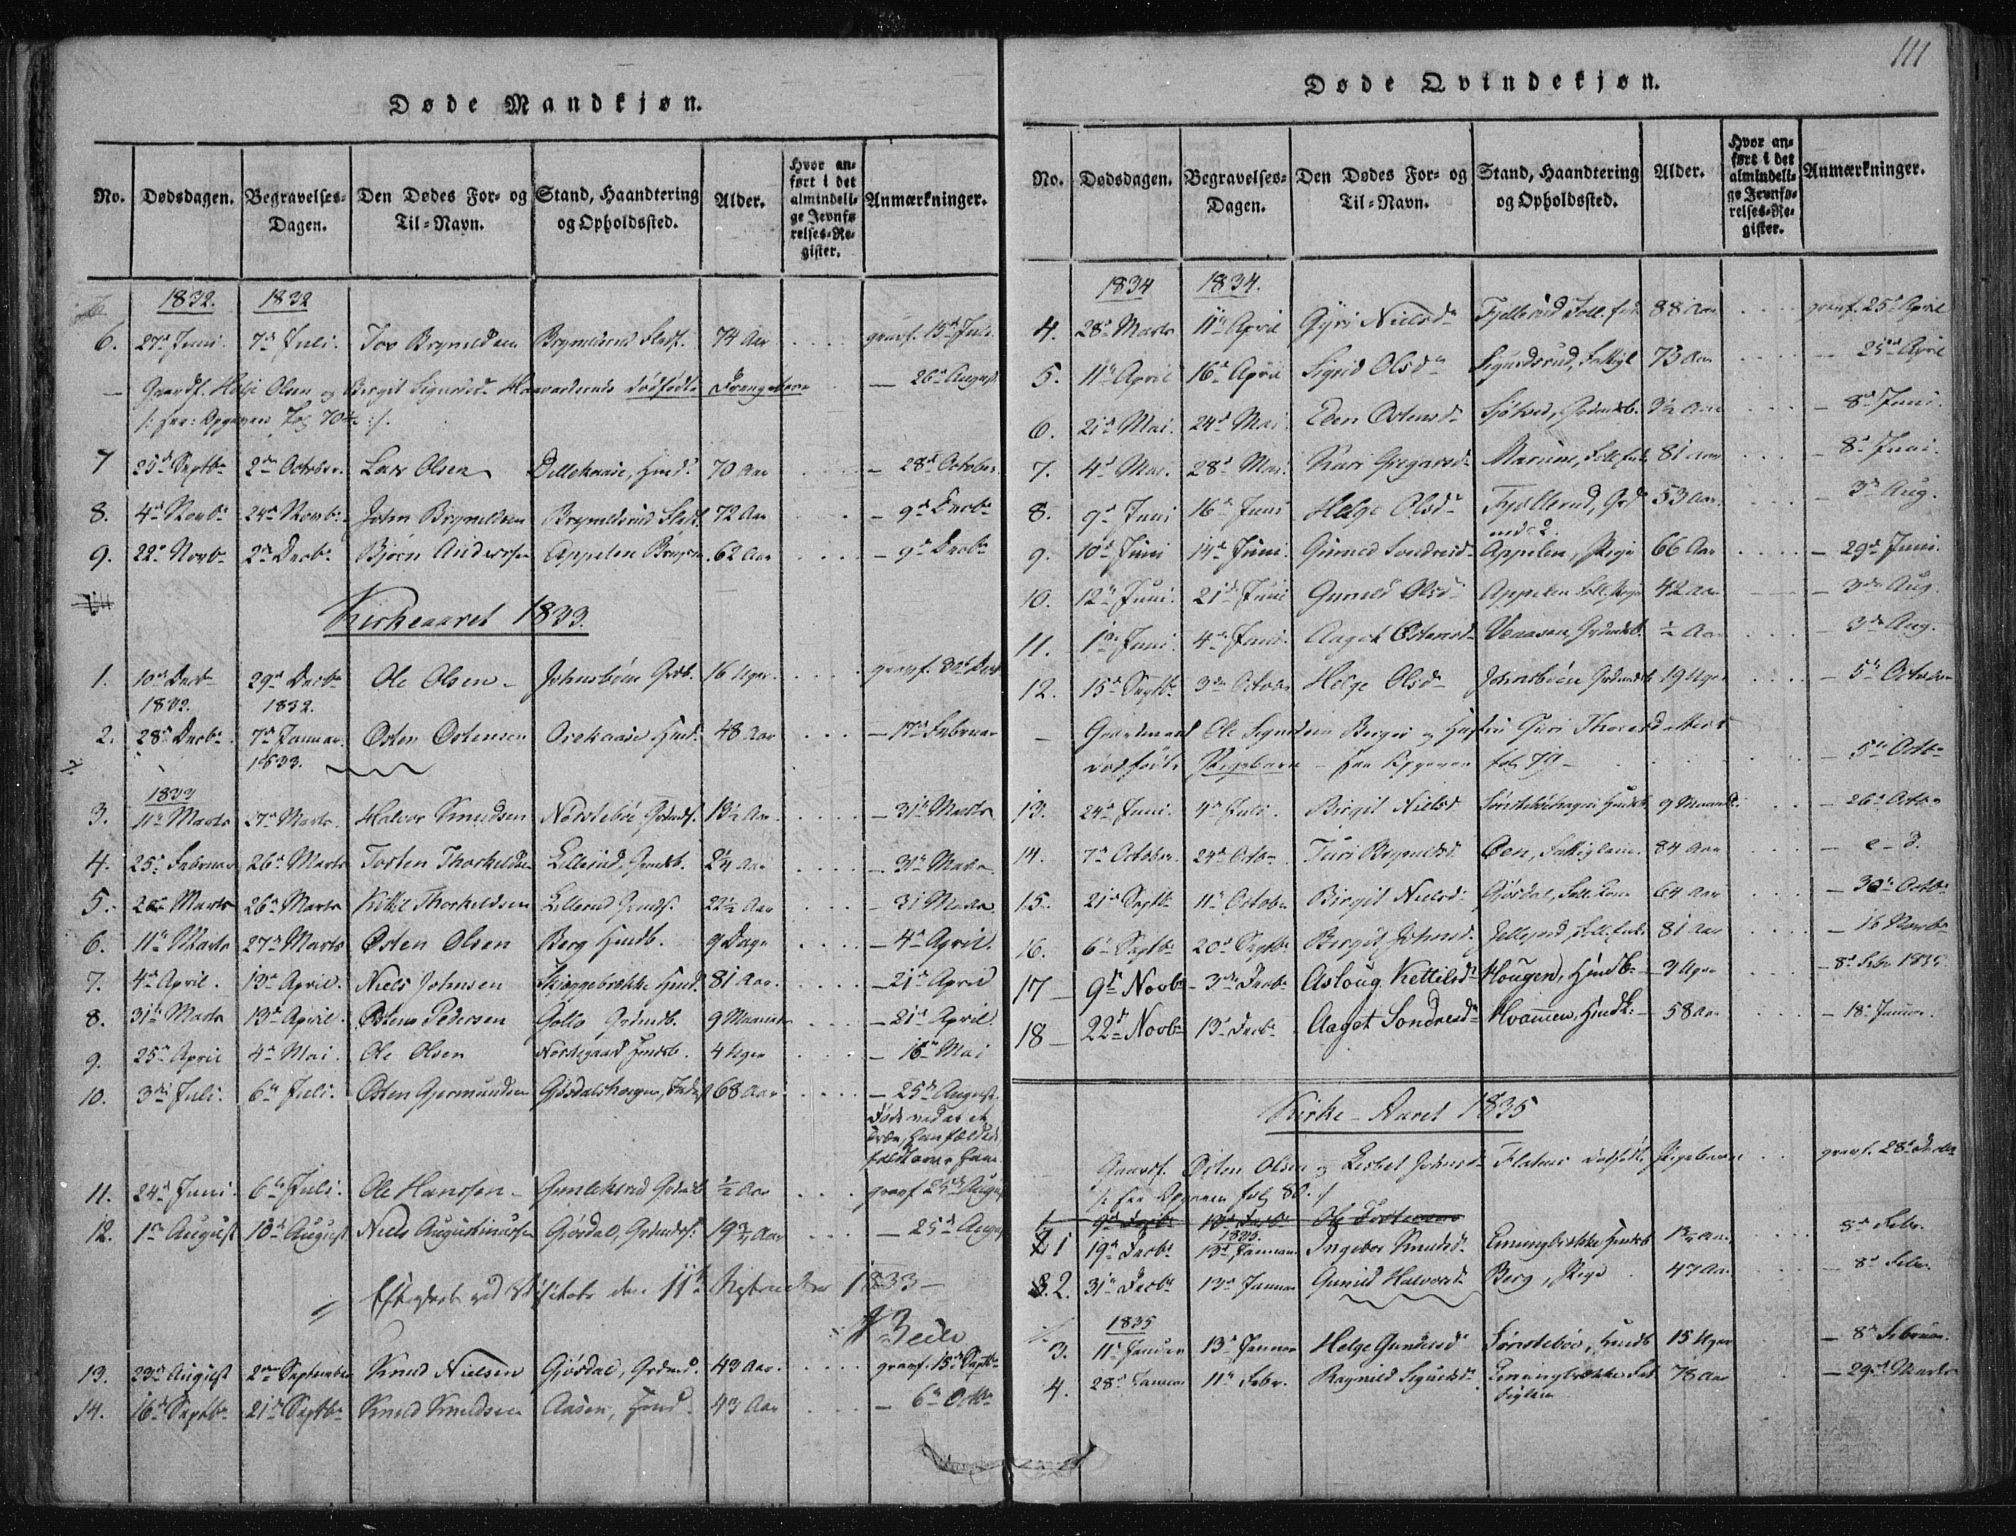 SAKO, Tinn kirkebøker, F/Fa/L0004: Ministerialbok nr. I 4, 1815-1843, s. 111